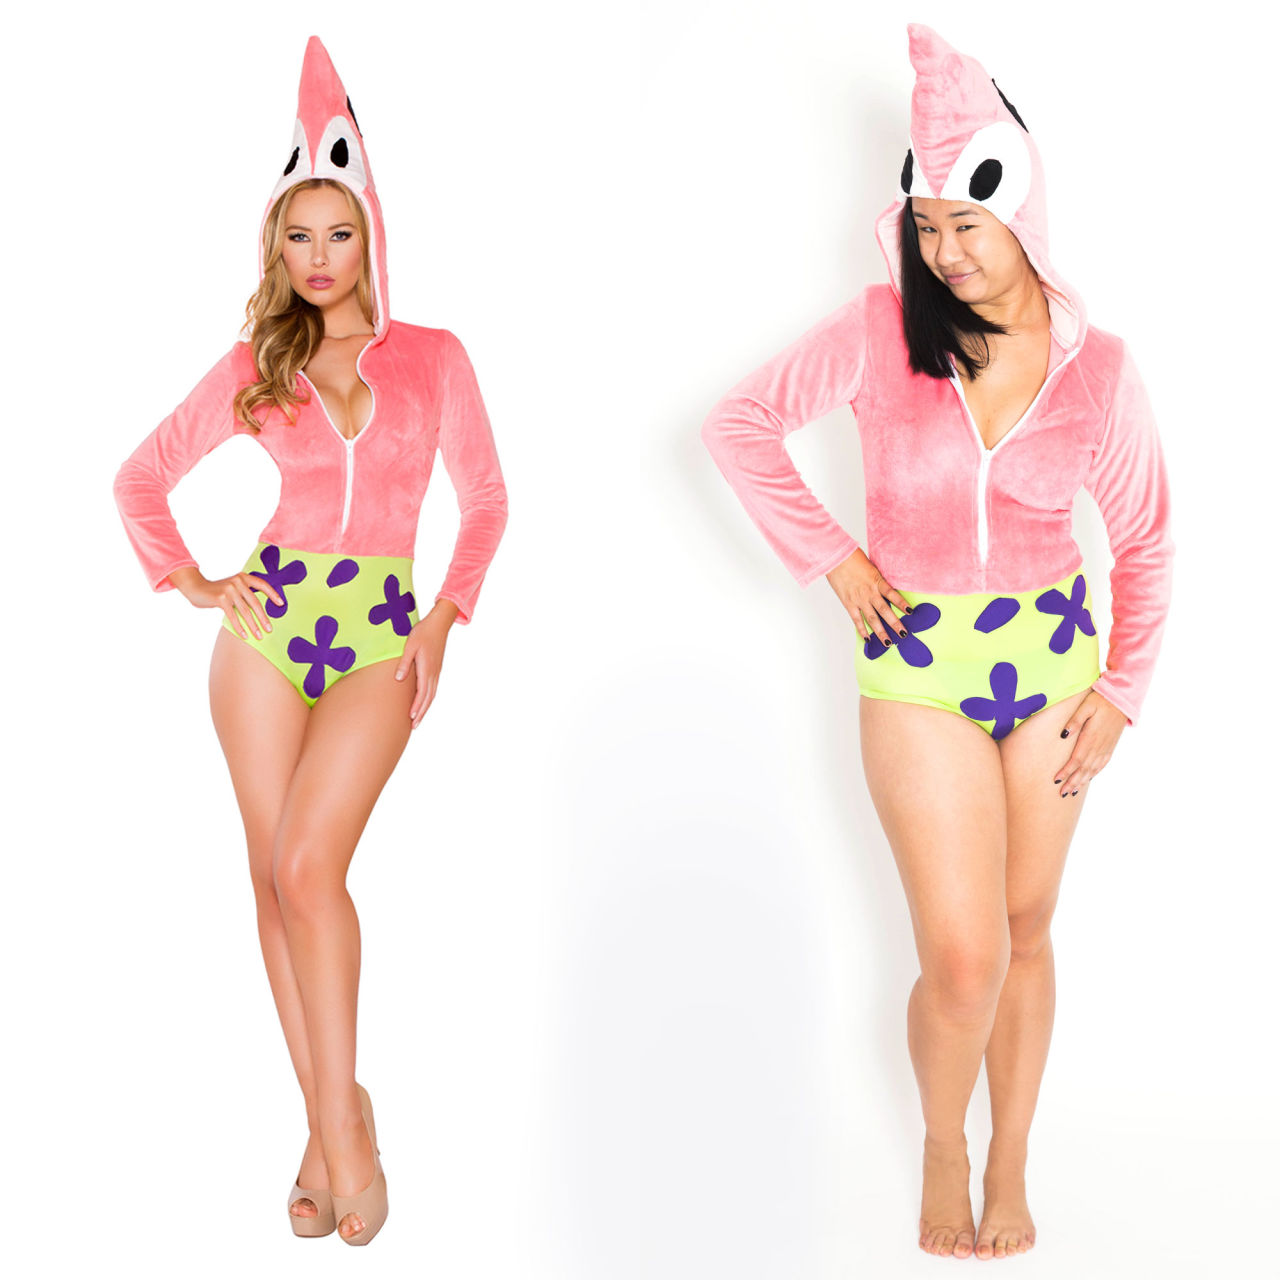 patrick starfish halloween costume - hallowen costum udaf